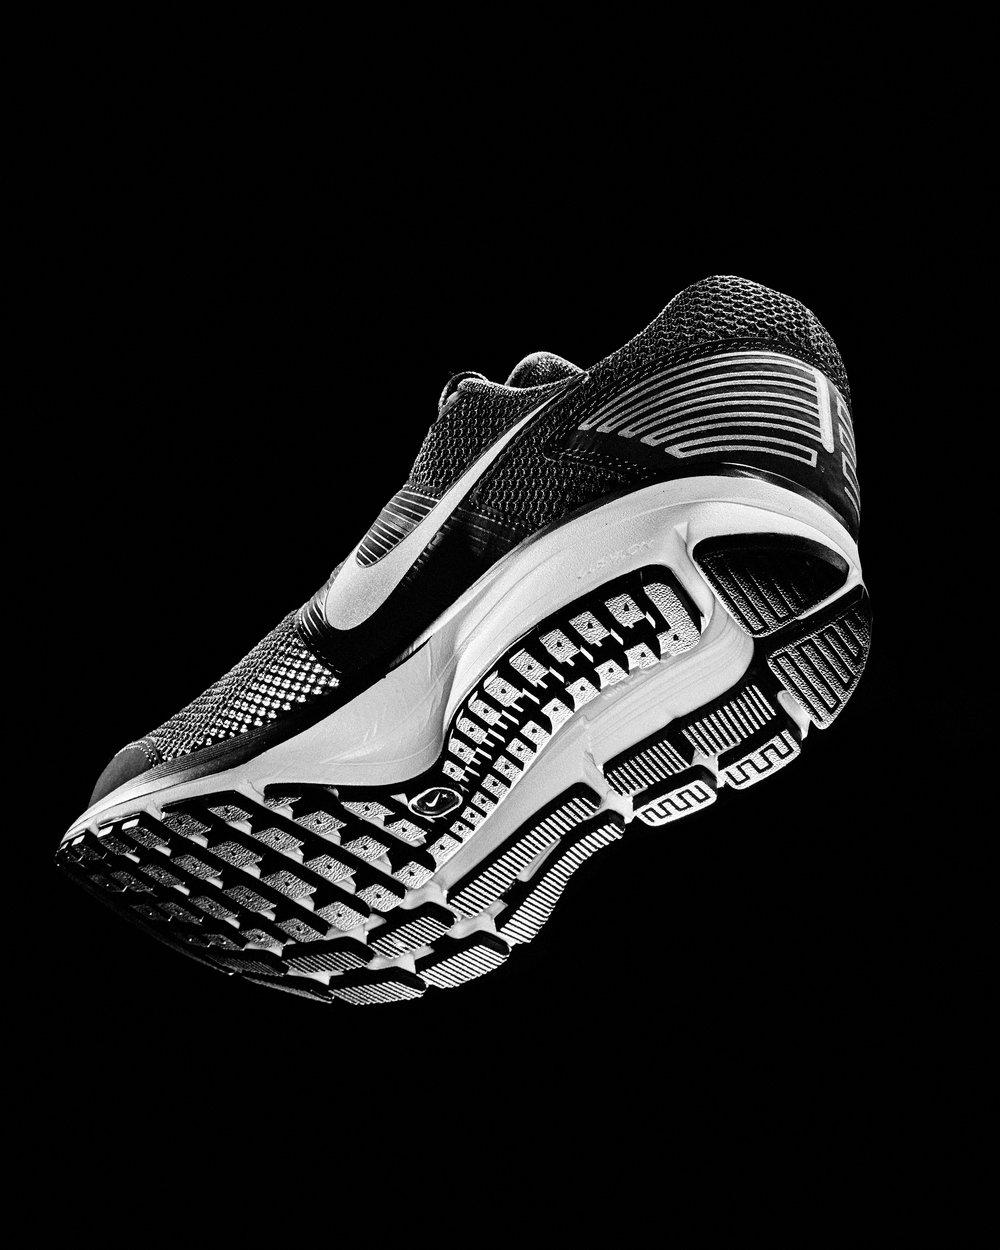 Nike1bw.jpg